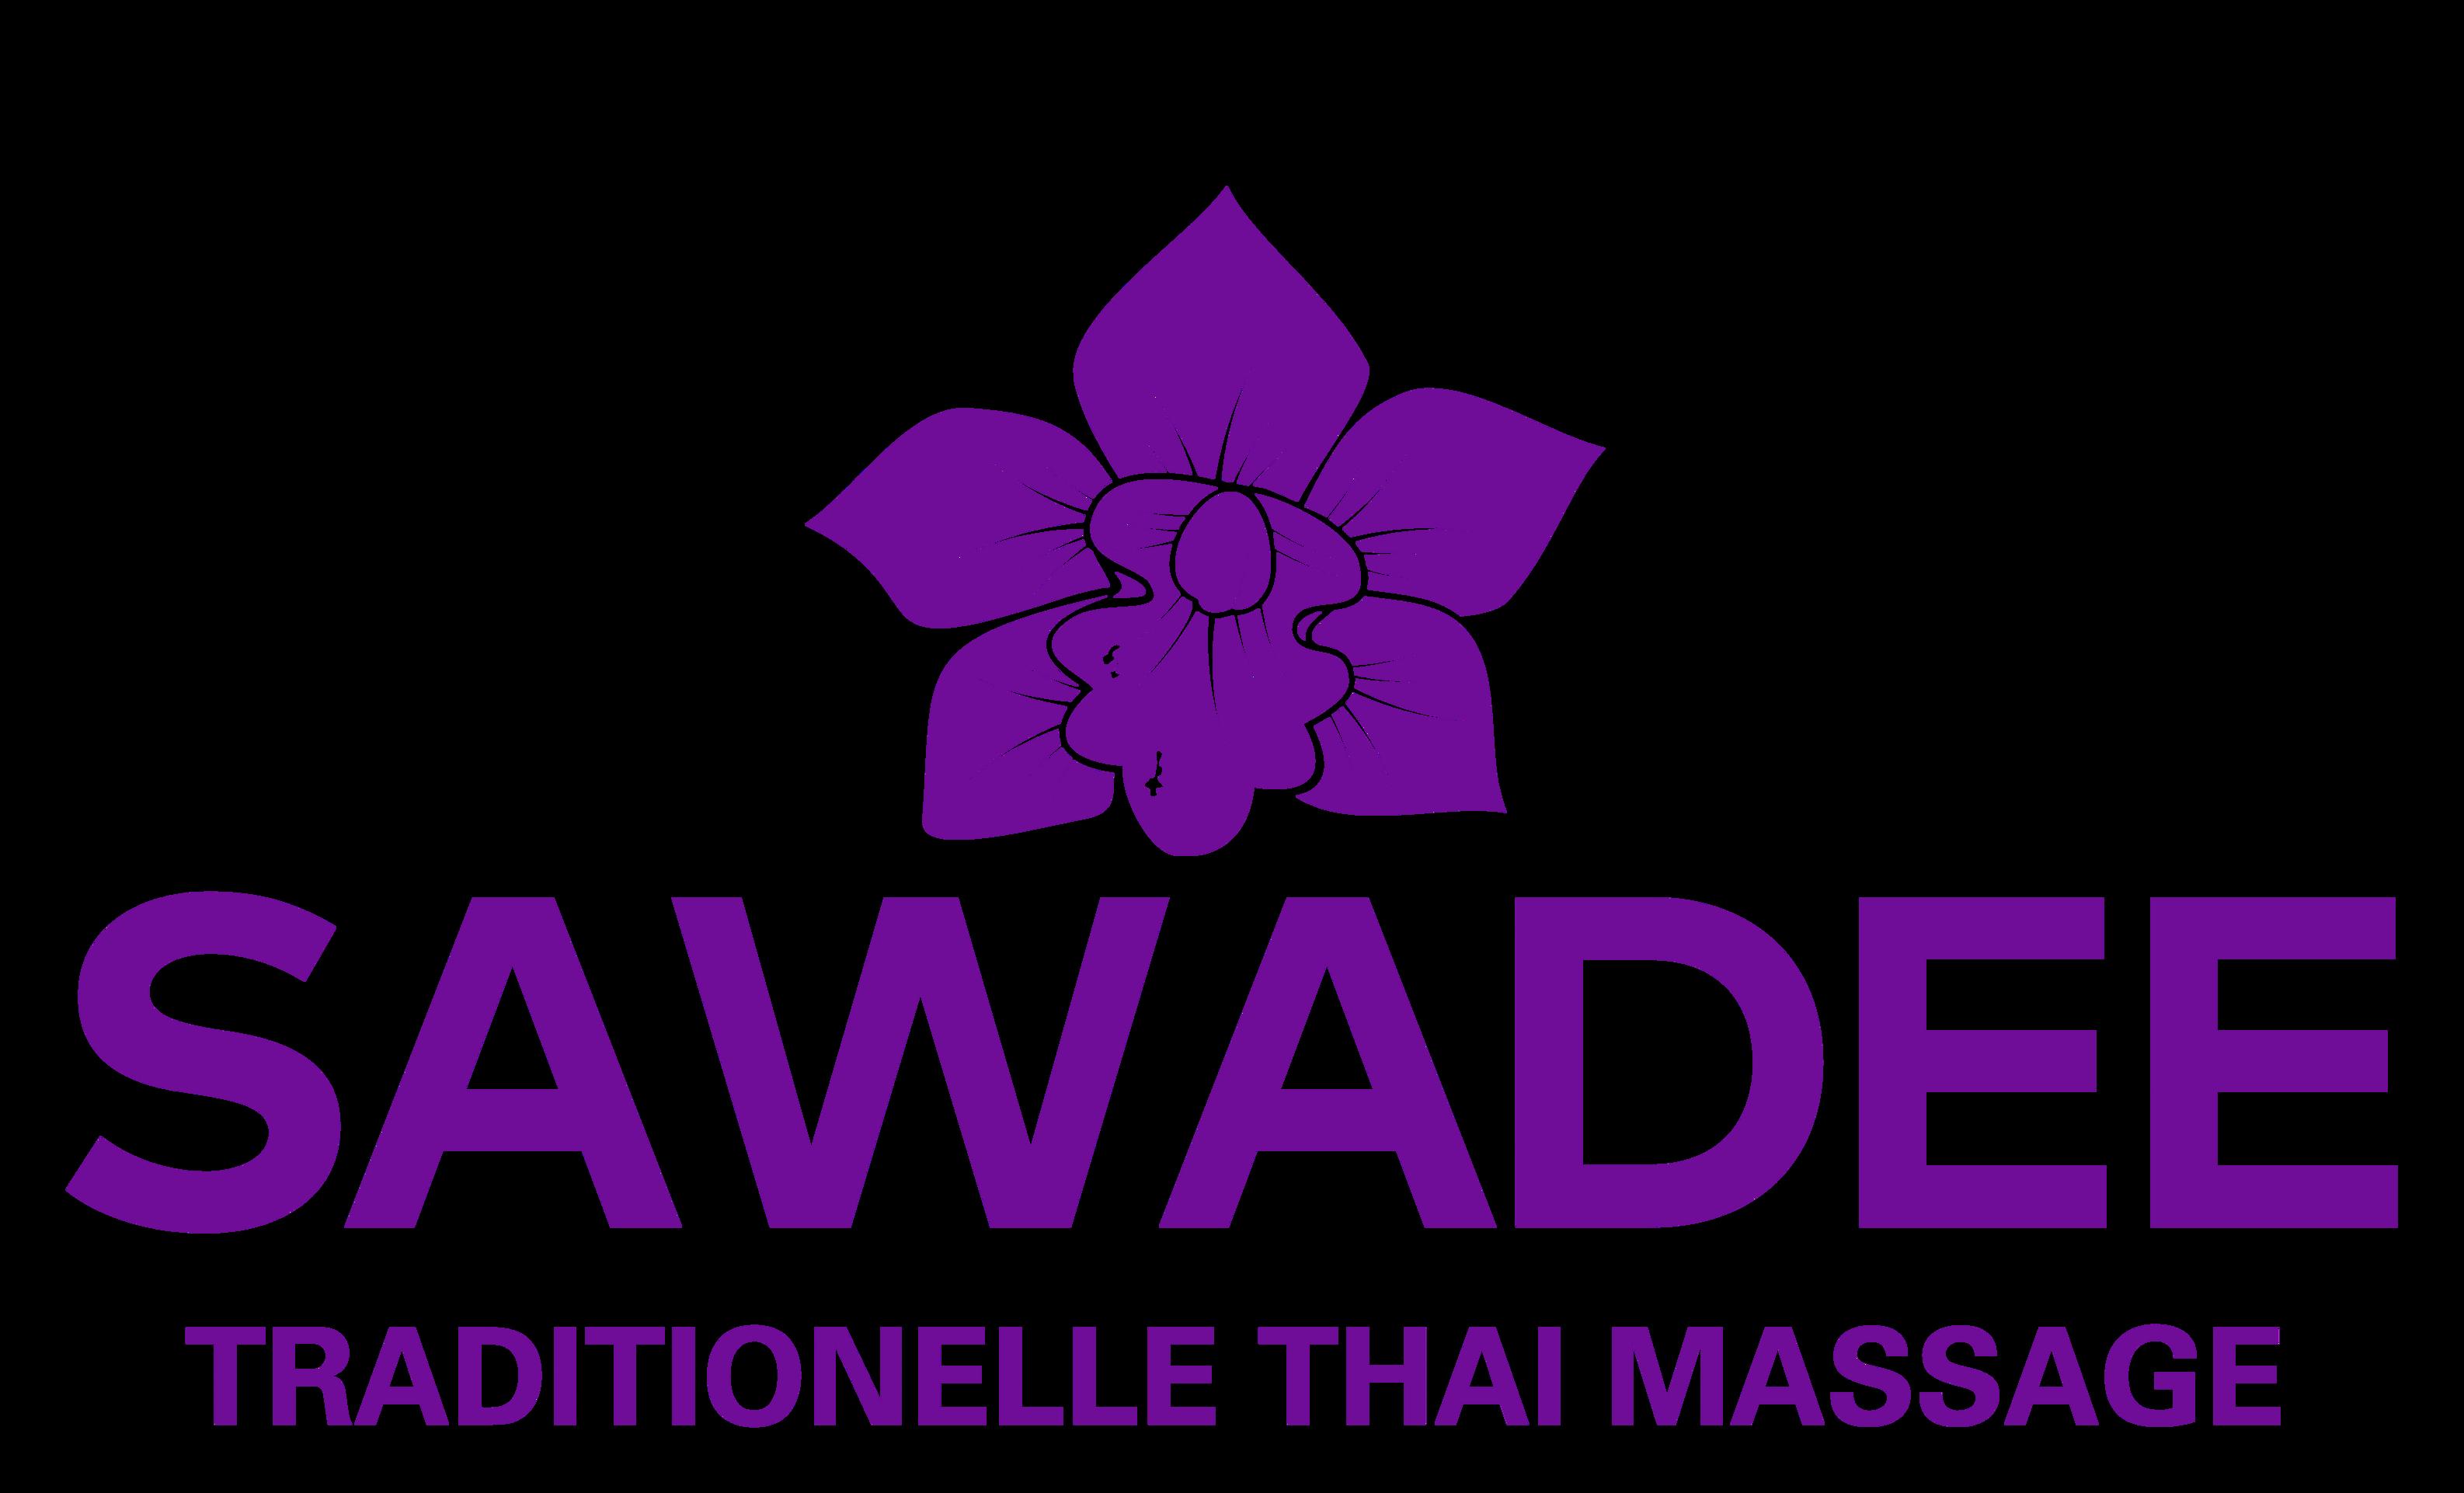 Sawadee Traditionelle Thai Massage